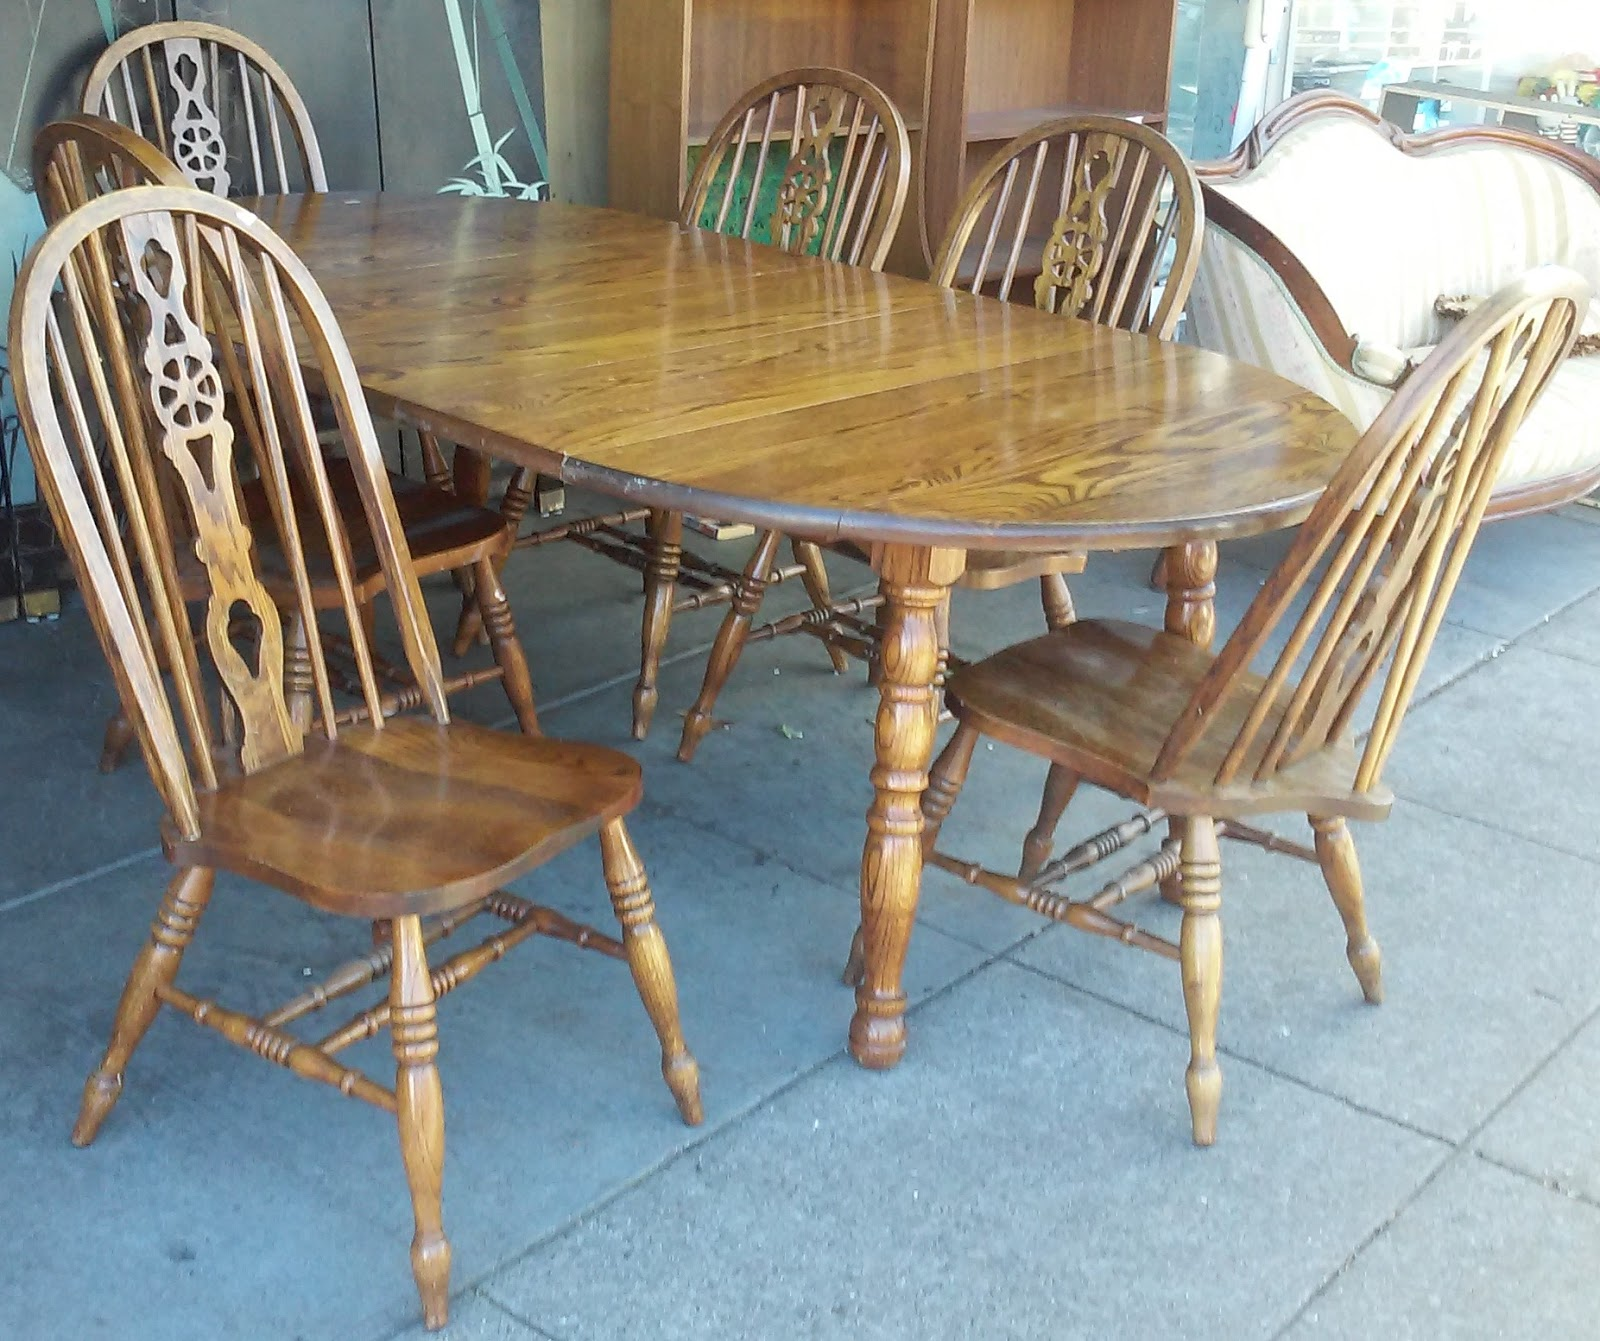 W Furniture: UHURU FURNITURE & COLLECTIBLES: SOLD #11688 H.W. Hull